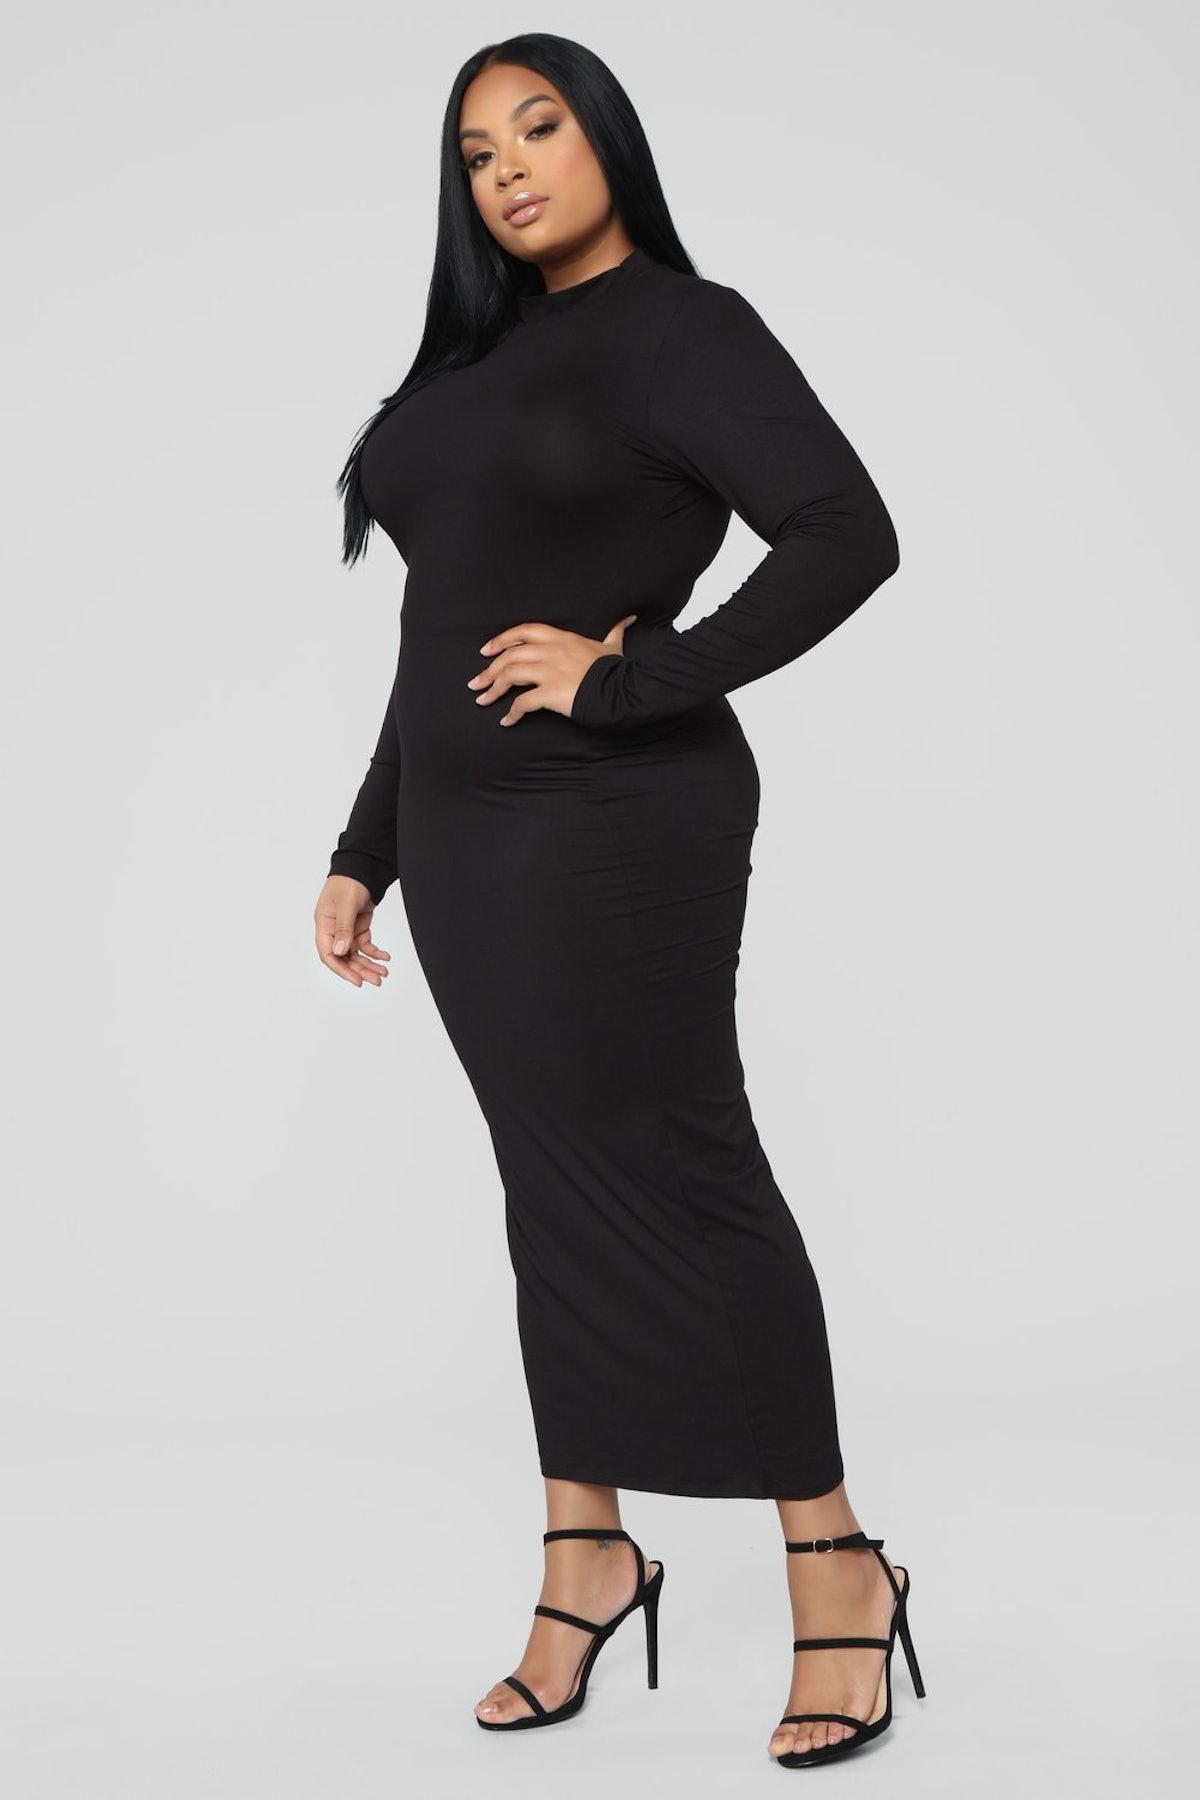 Full Coverage Maxi Dress - Black